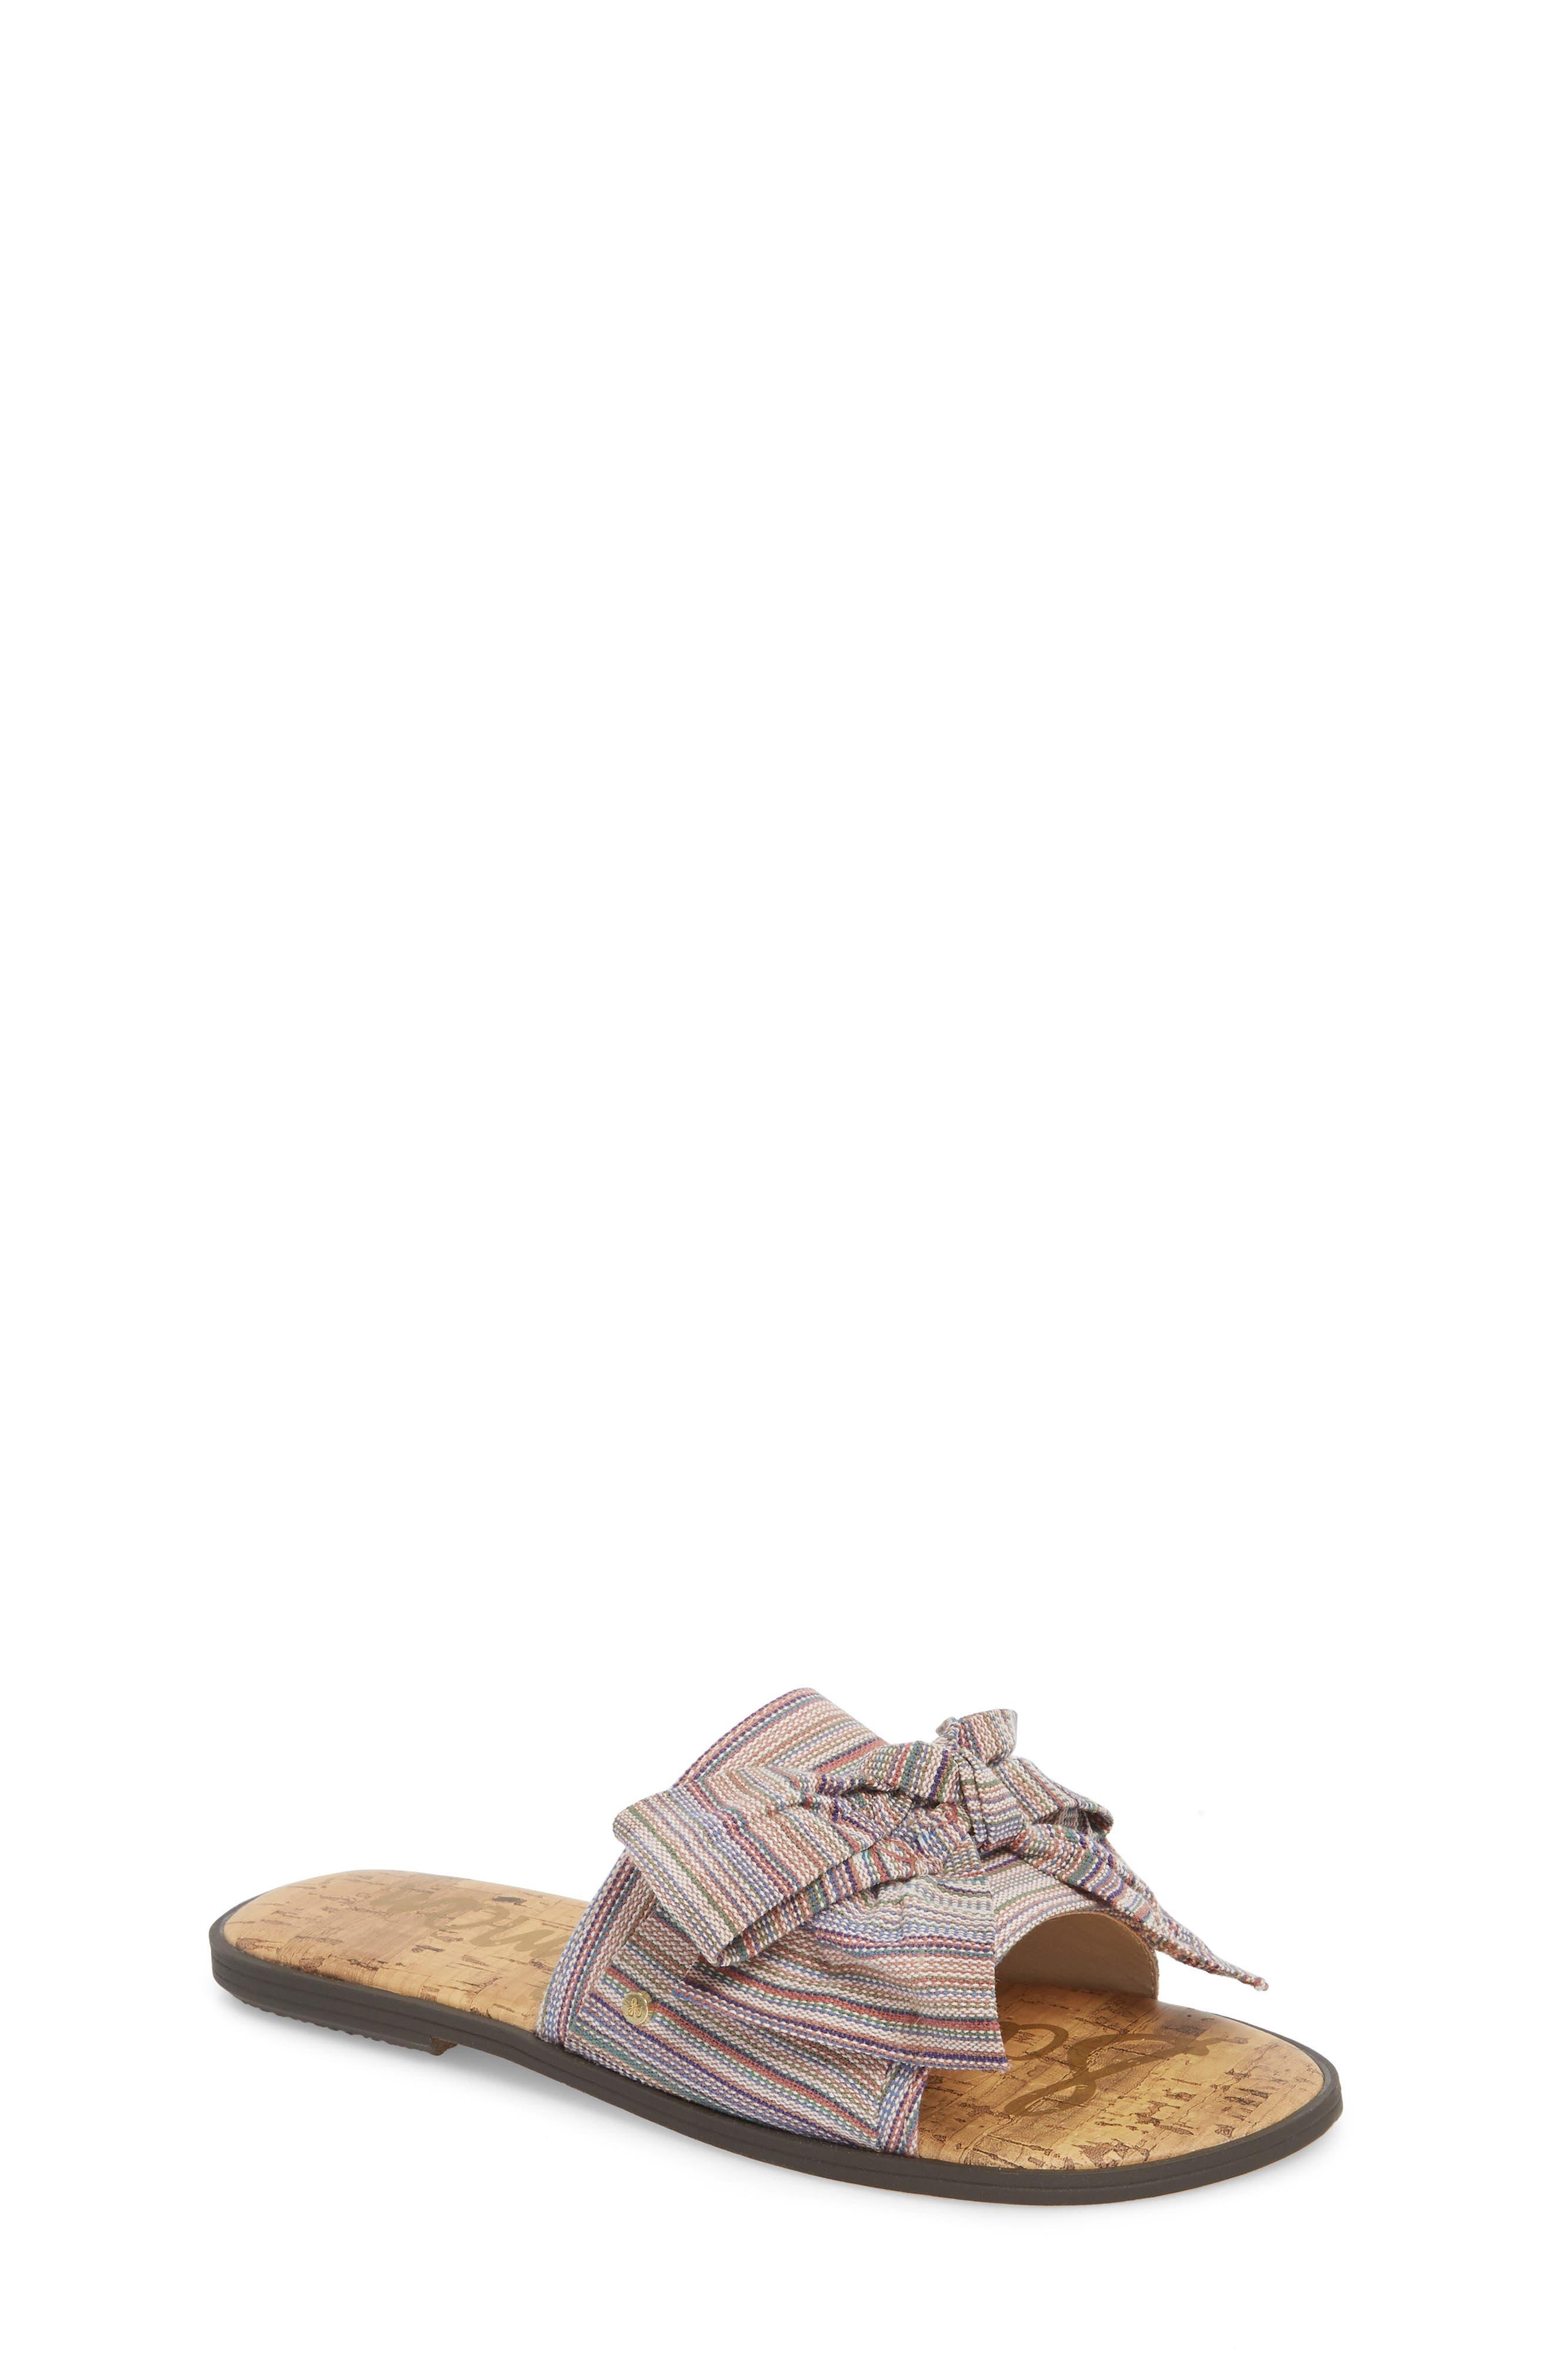 Gigi Bow Faux Leather Sandal,                             Main thumbnail 1, color,                             Tan Multi Fabric